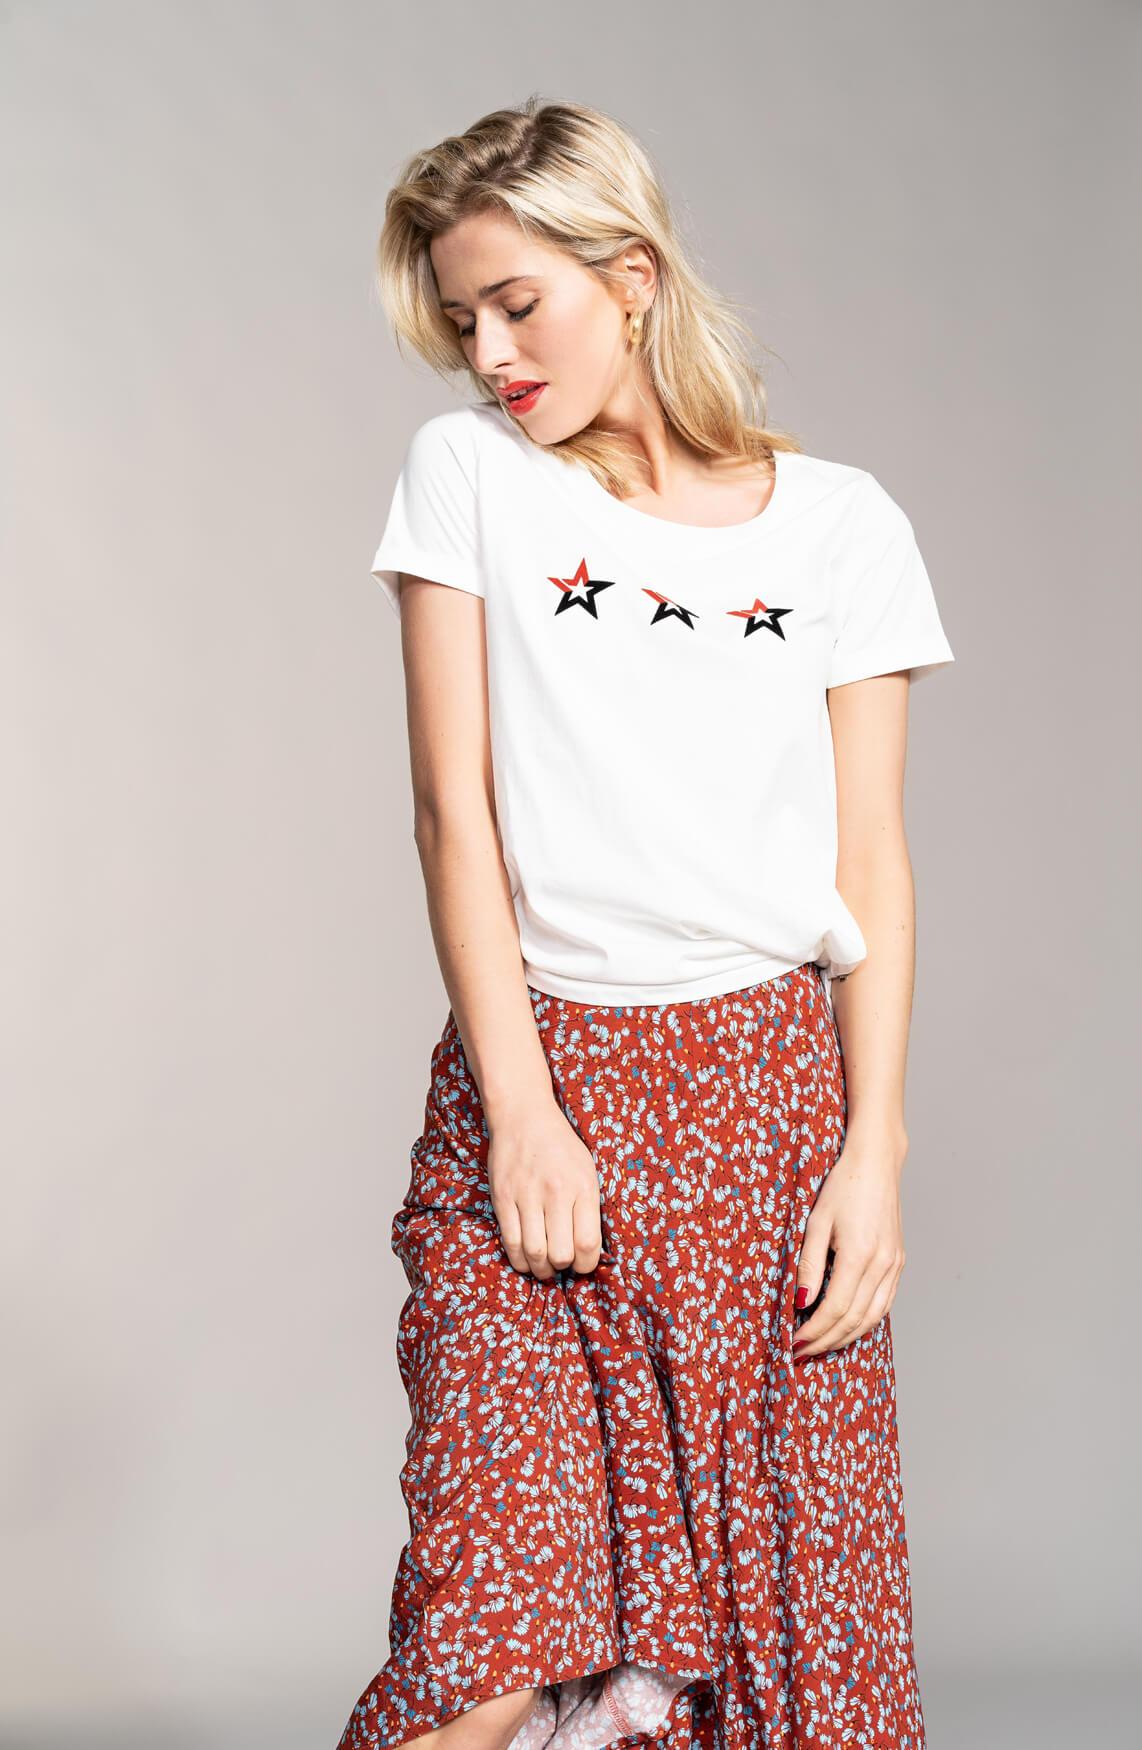 Anna Dames Shirt met sterren wit